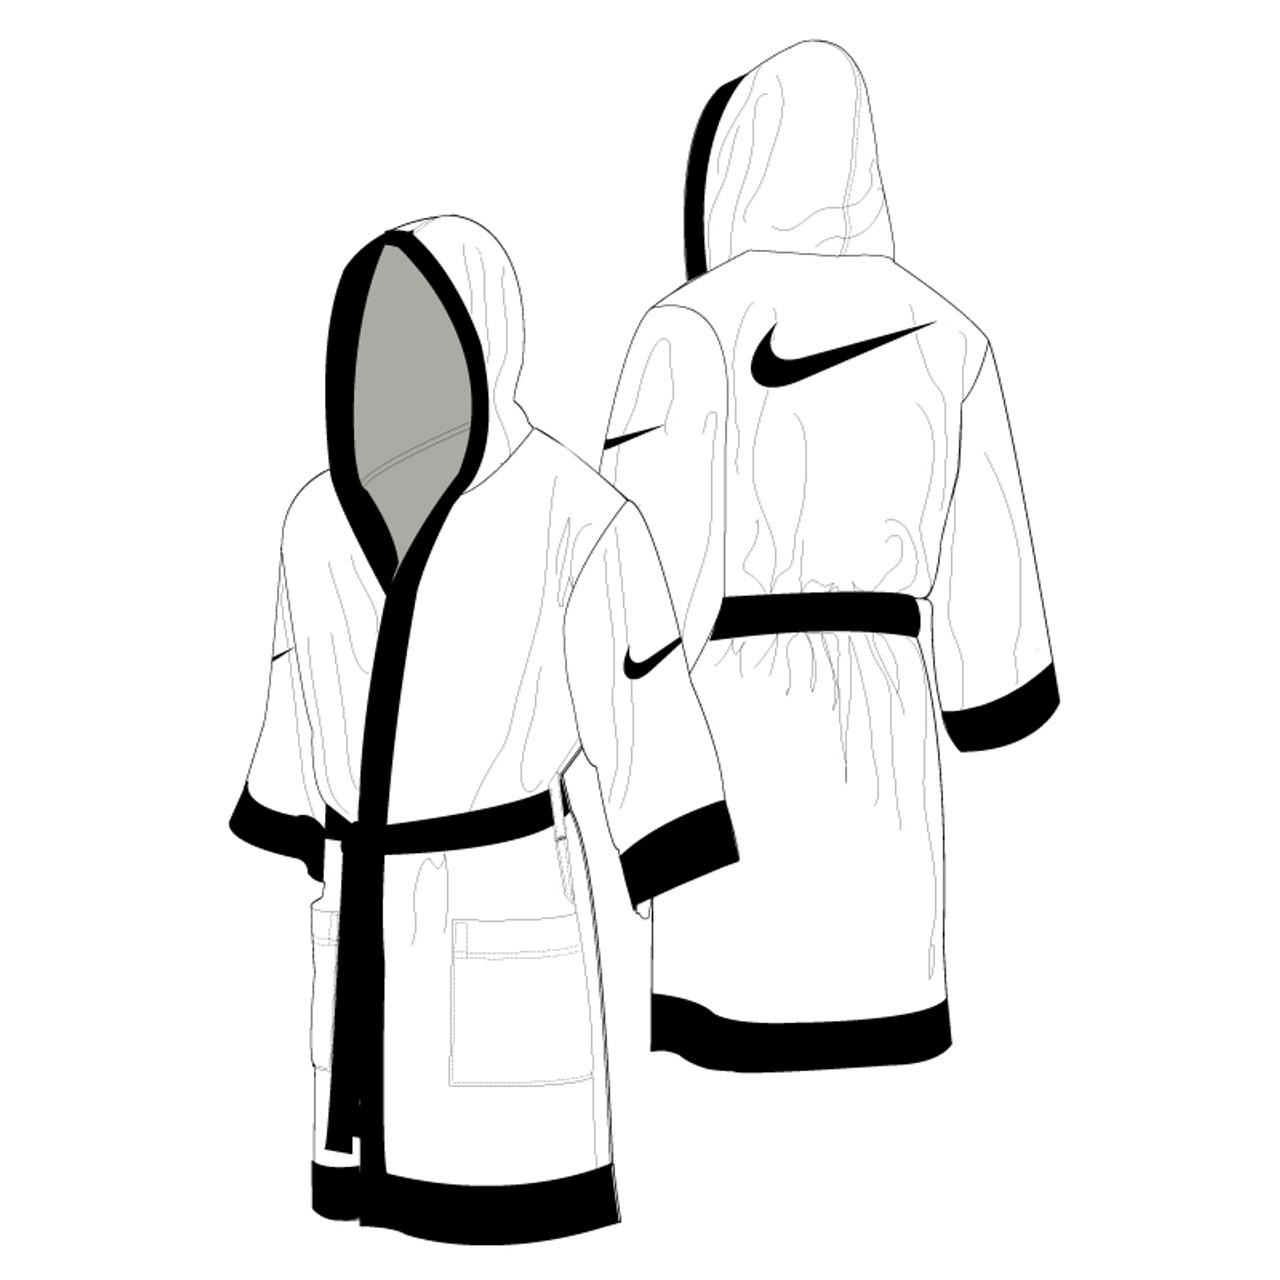 Nike Boxing Robe - White   Black - Athlete Performance Solutions EU 7fe7bb2825be